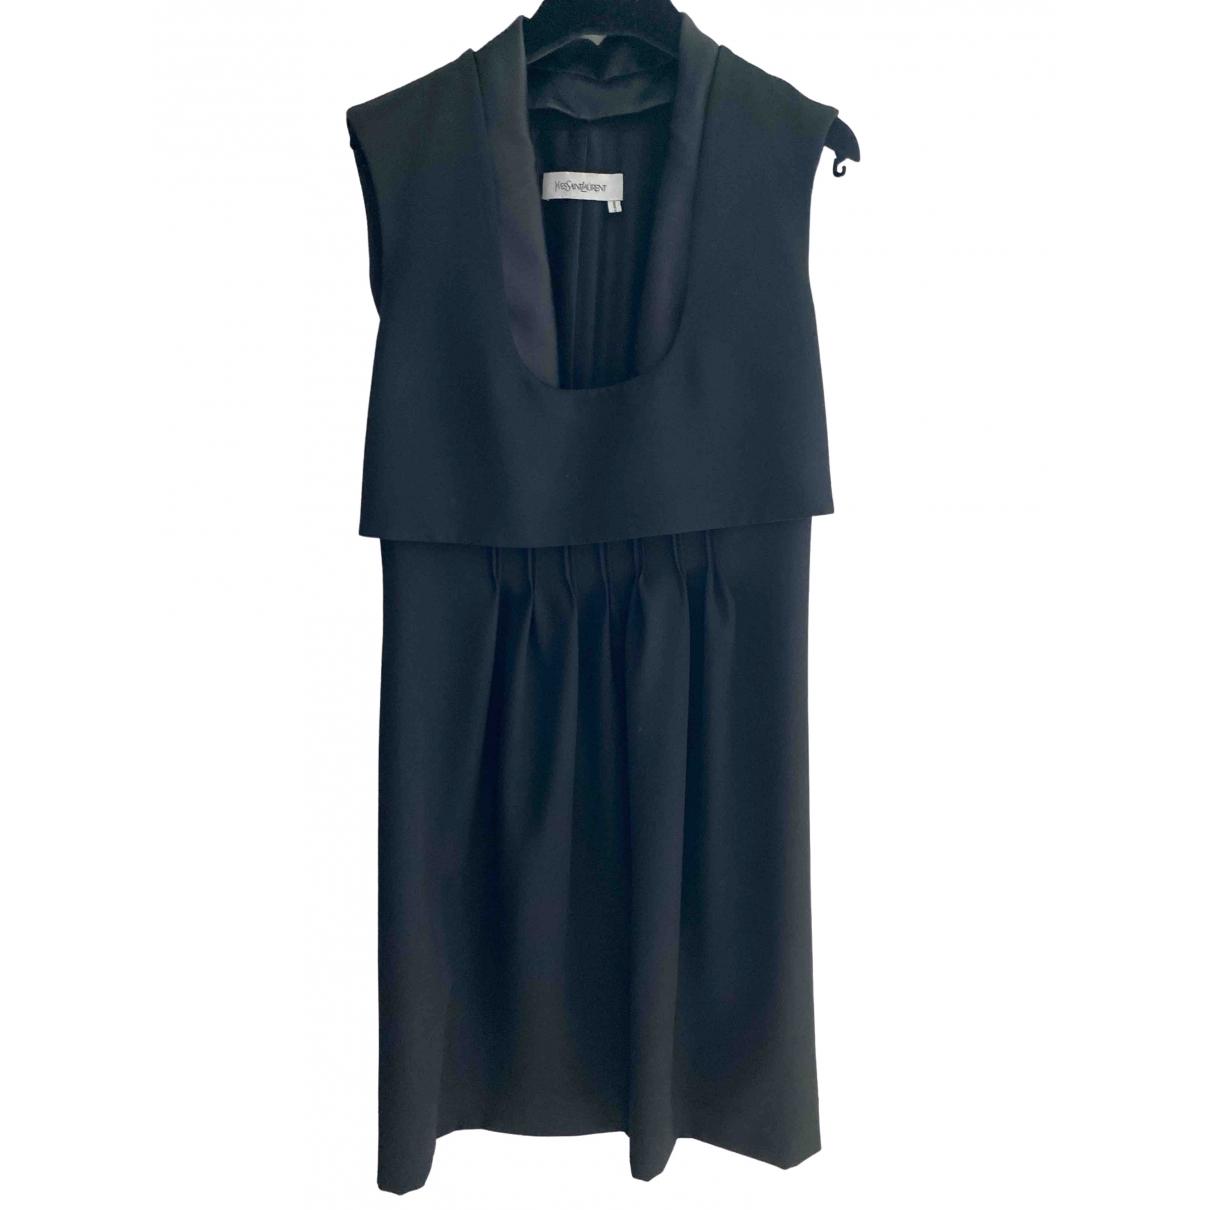 Vestido midi de Lana Yves Saint Laurent